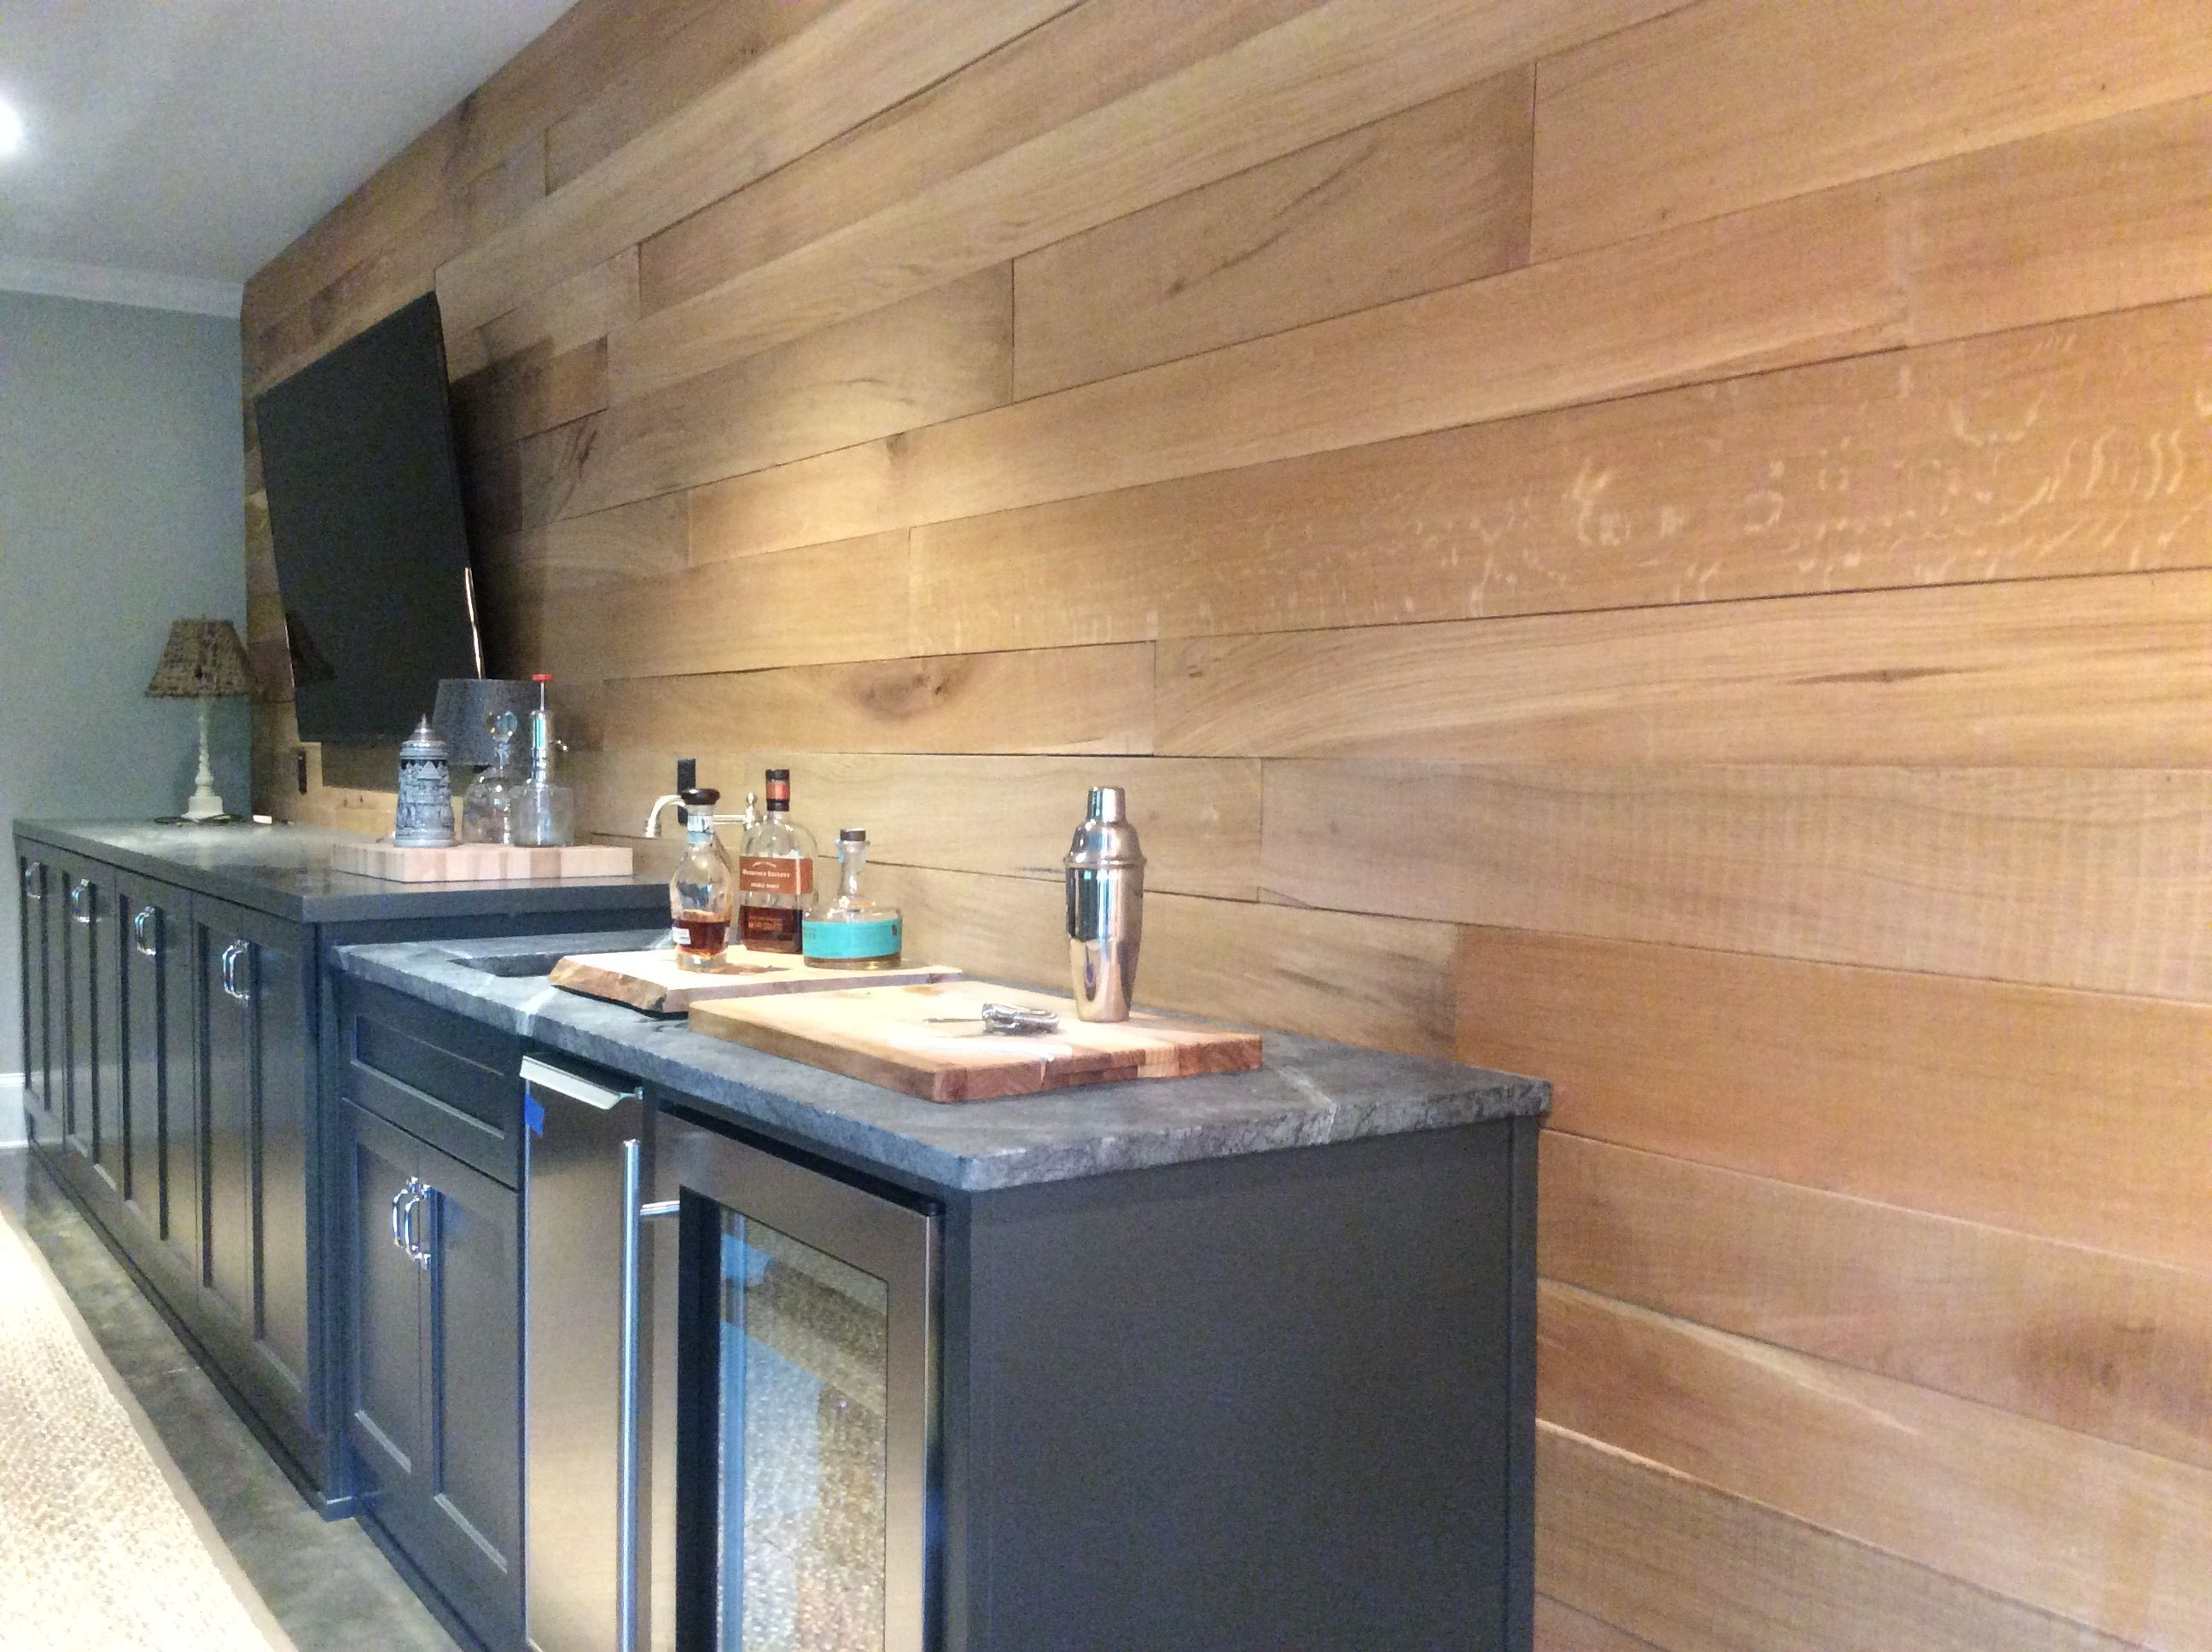 Eutree Forest Free White Oak Accent Wood Wall Paneling Wood Panel Walls Basement Wall Panels Wood Paneling